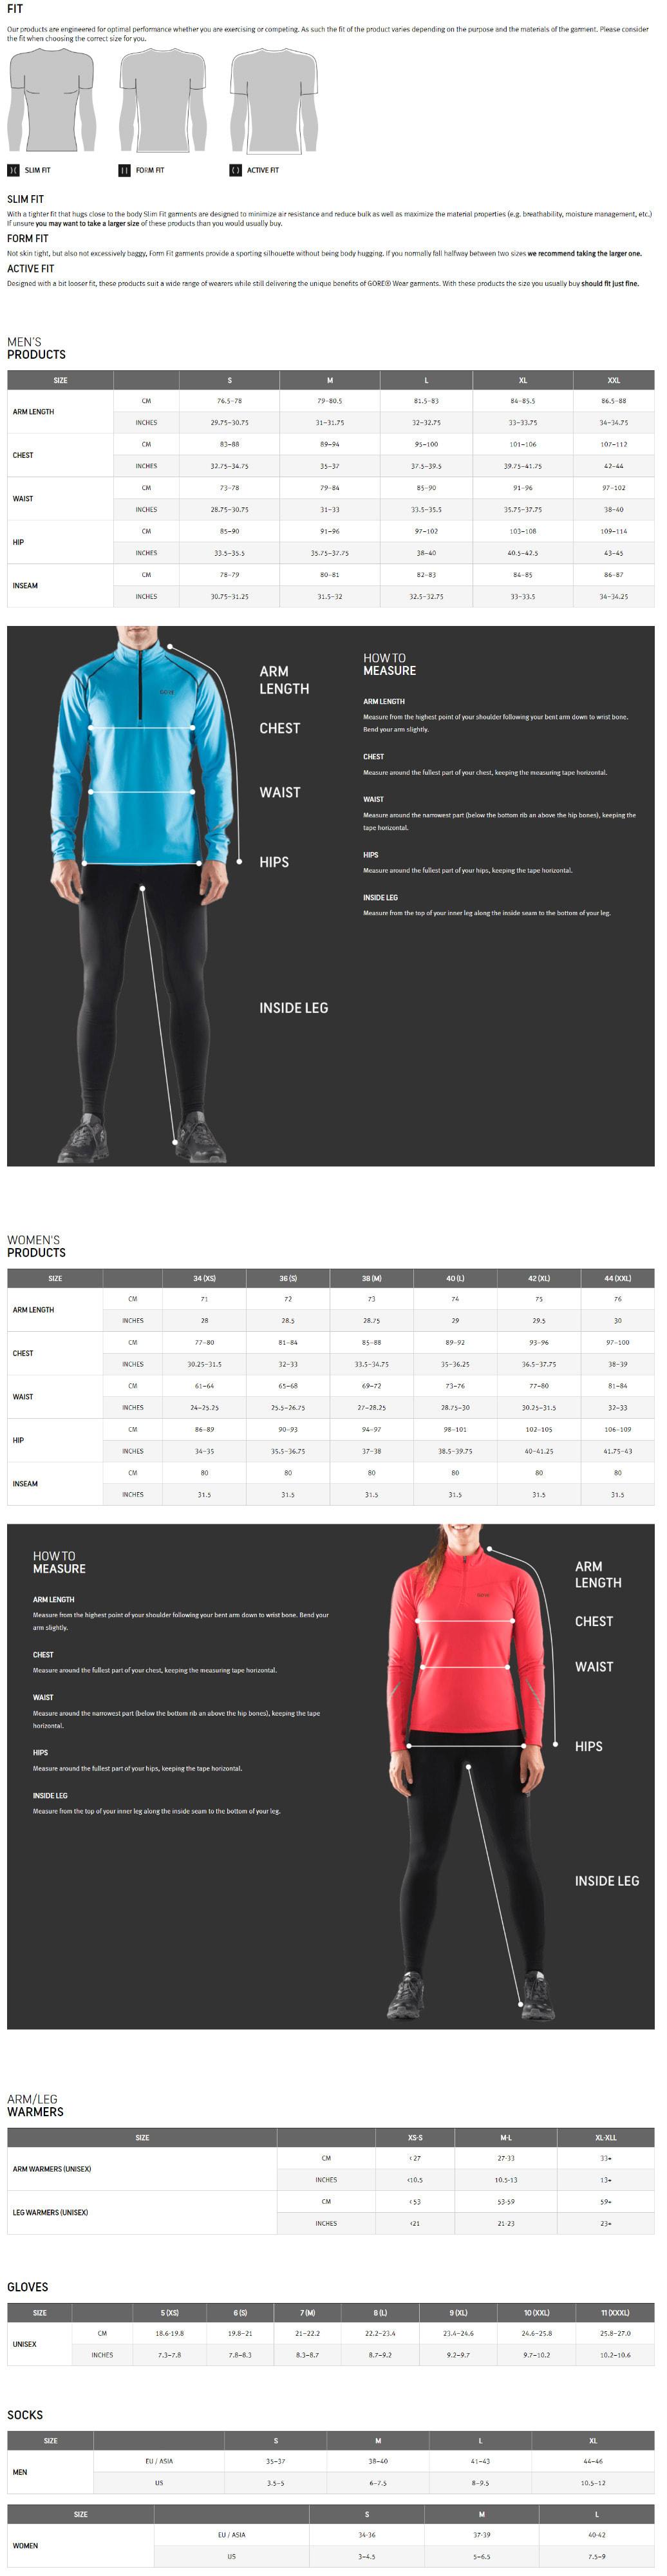 Gore Wear Size Charts